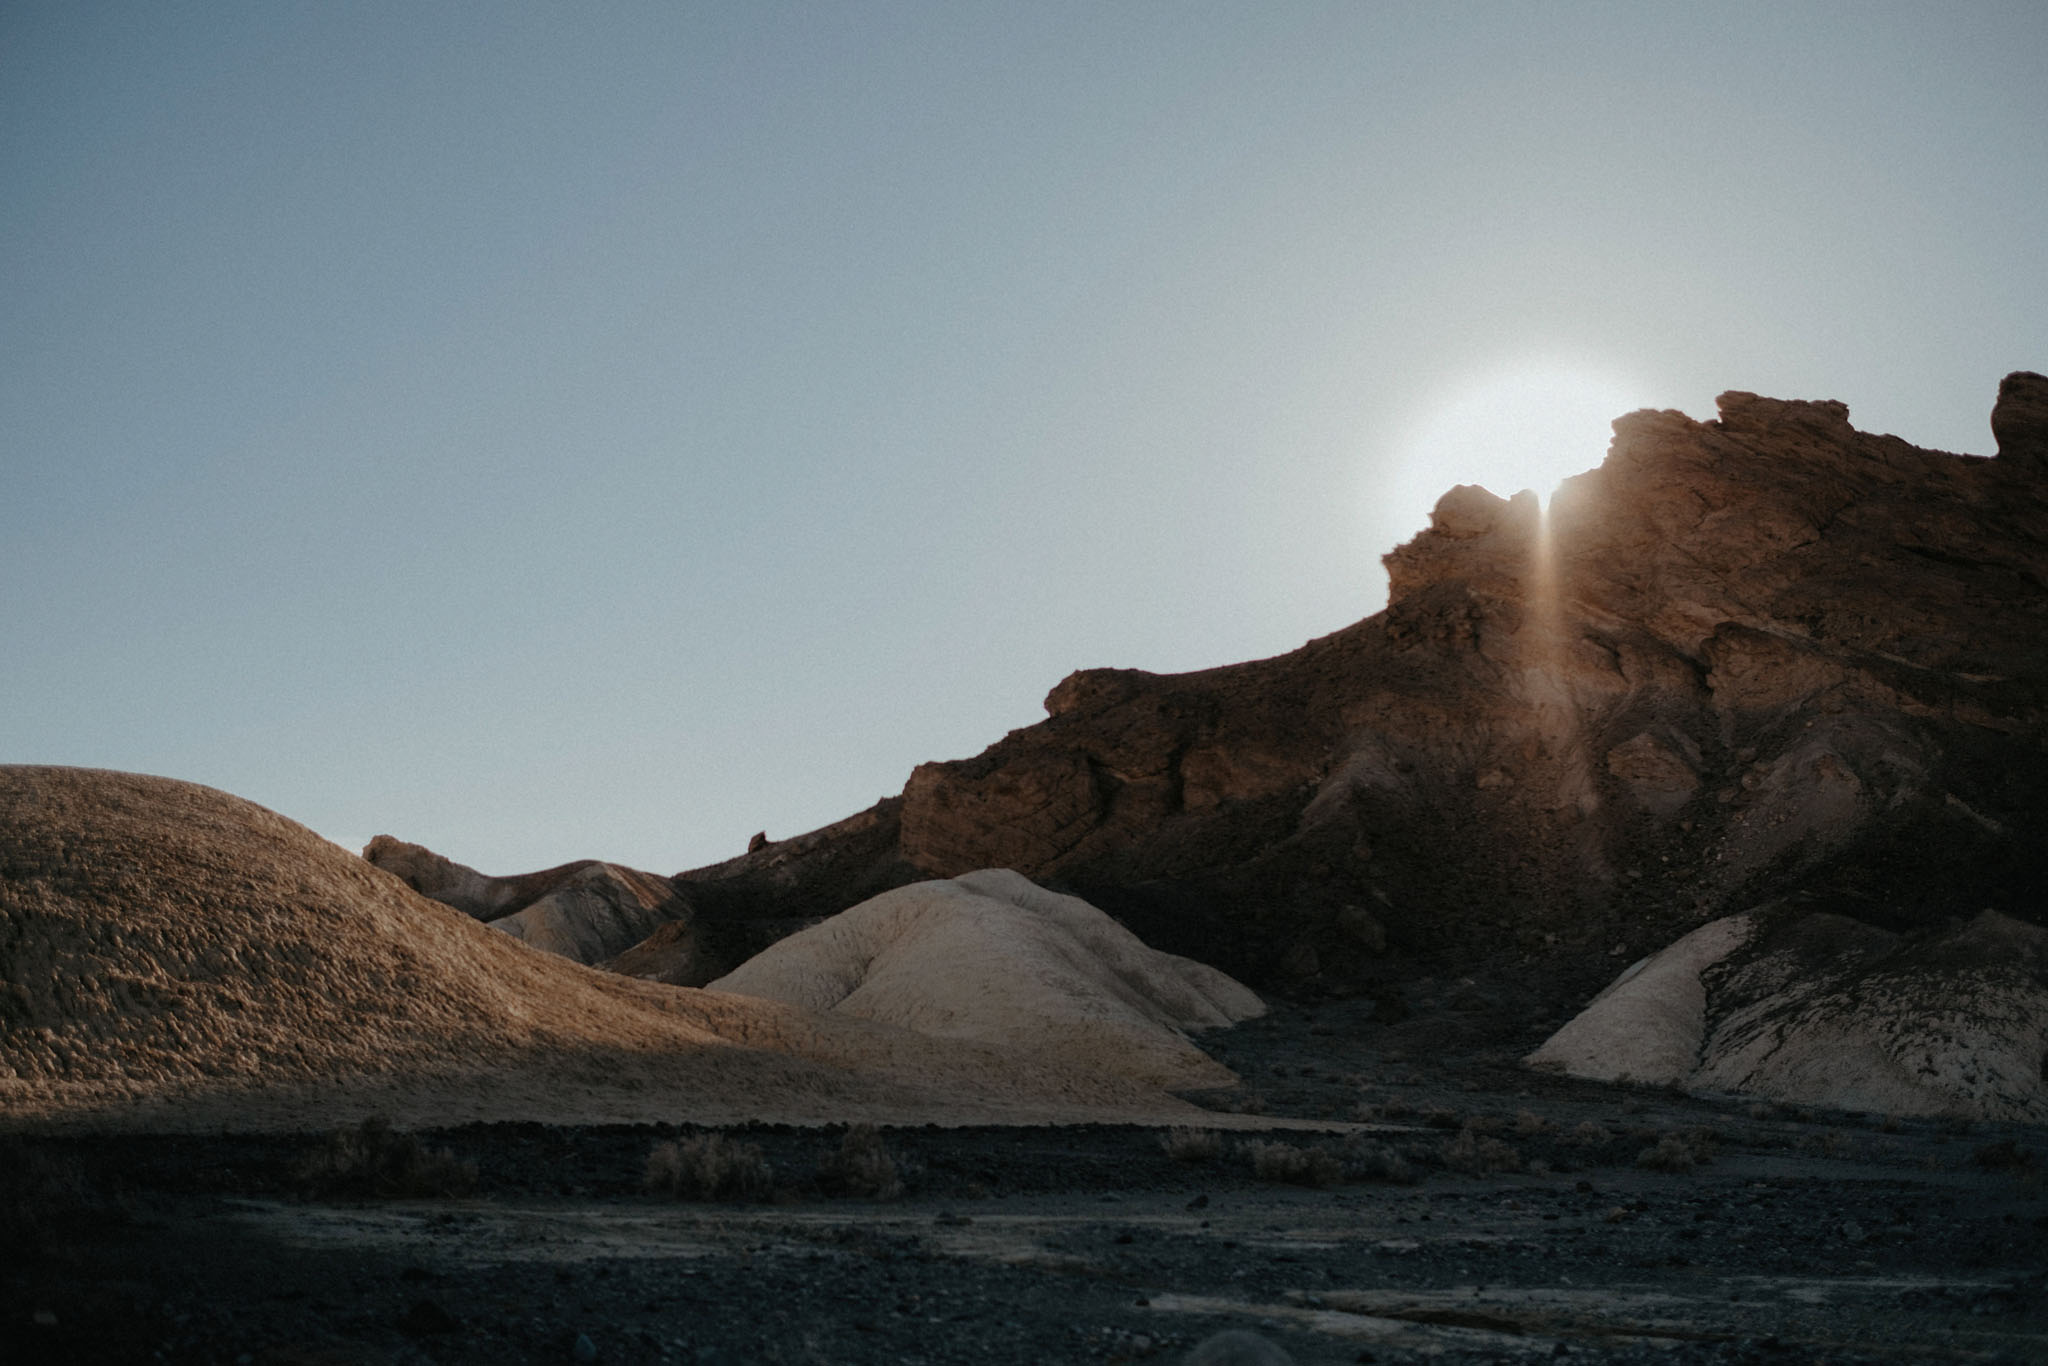 death valley adventure elopement wedding photographer national park desert landscape